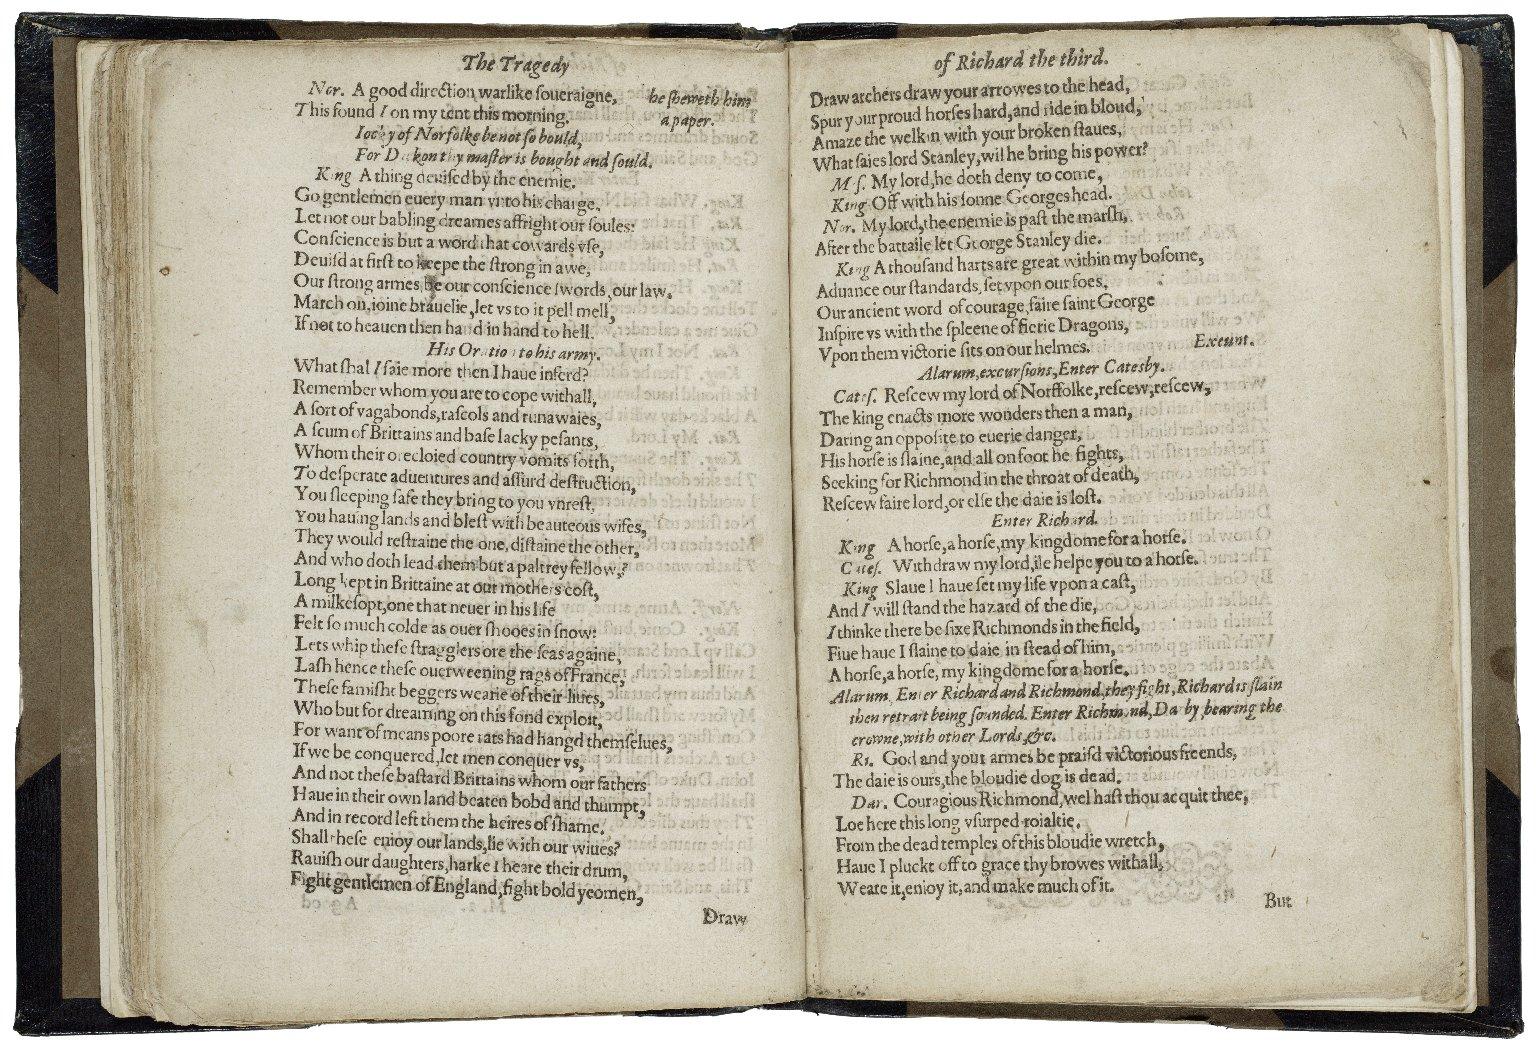 [King Richard III] The tragedy of King Richard the third.